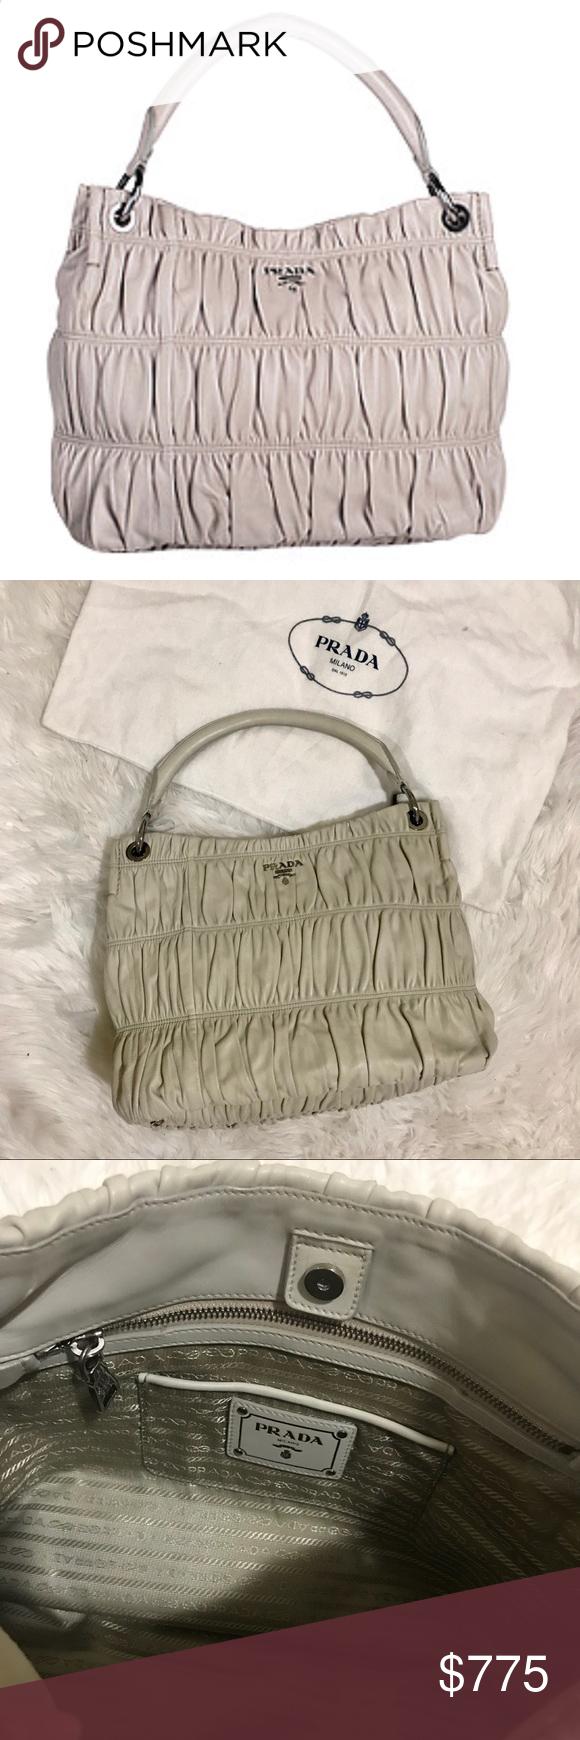 10c99fff02bc Prada Nappa Gaufre Hobo Bag Beige lambskin leather with embossed Gaufre  effect, single shoulder strap, silvertone hardware, open top closure, 4  metal feet.